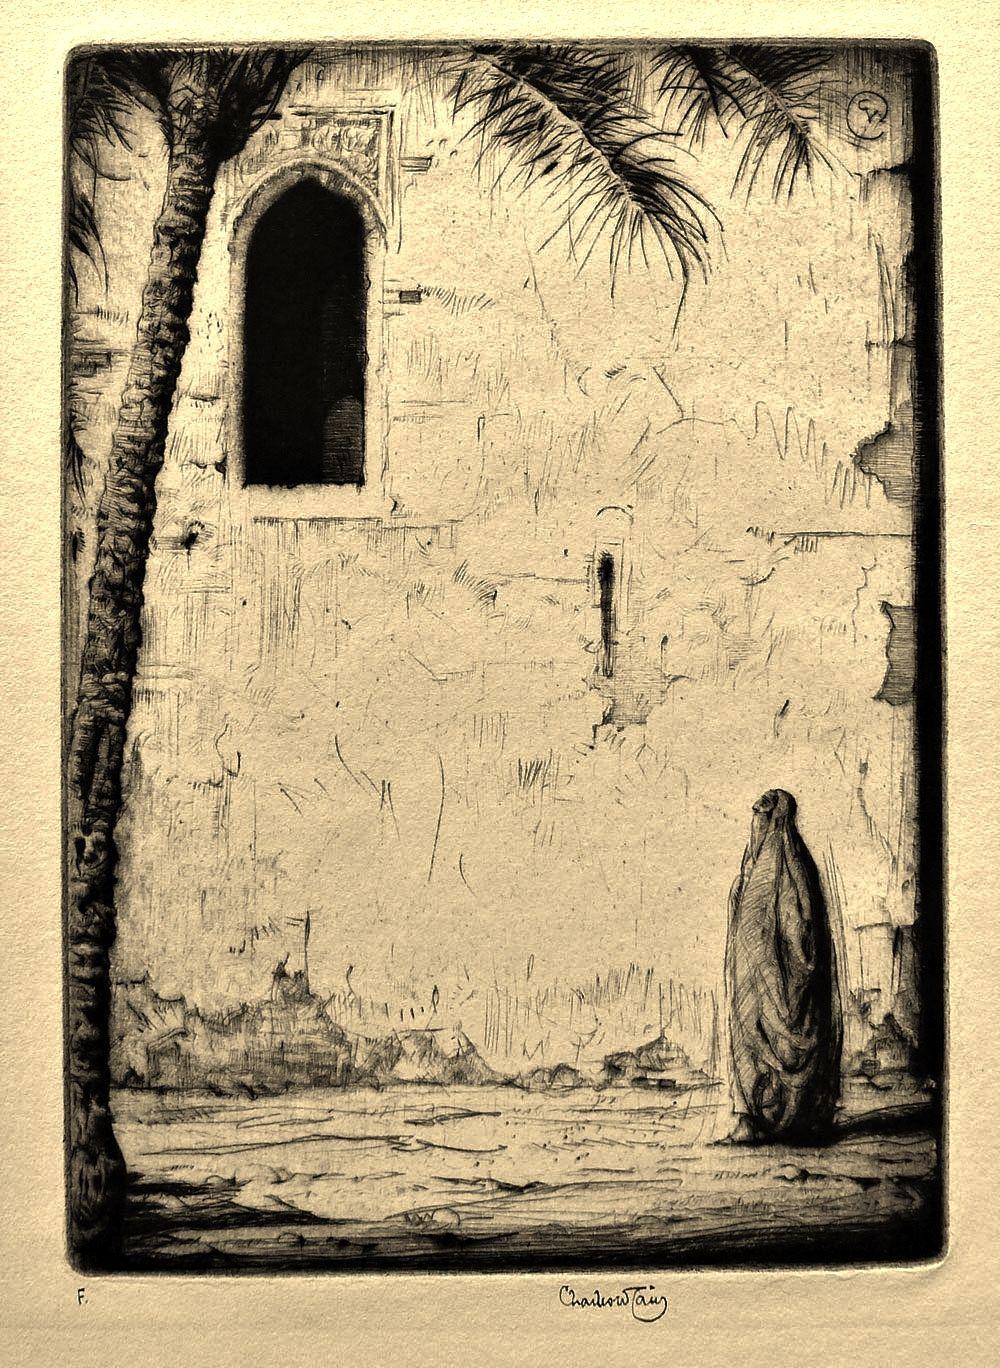 Sabahalnassery بـيـن دجـلـة والـفـرات مـدونـة الـد كـتـور صـبـاح الـن ـاصـري دراسـات عـن تـاريـخ الـعـراق الـث ـقـافي Art Painting Iraq